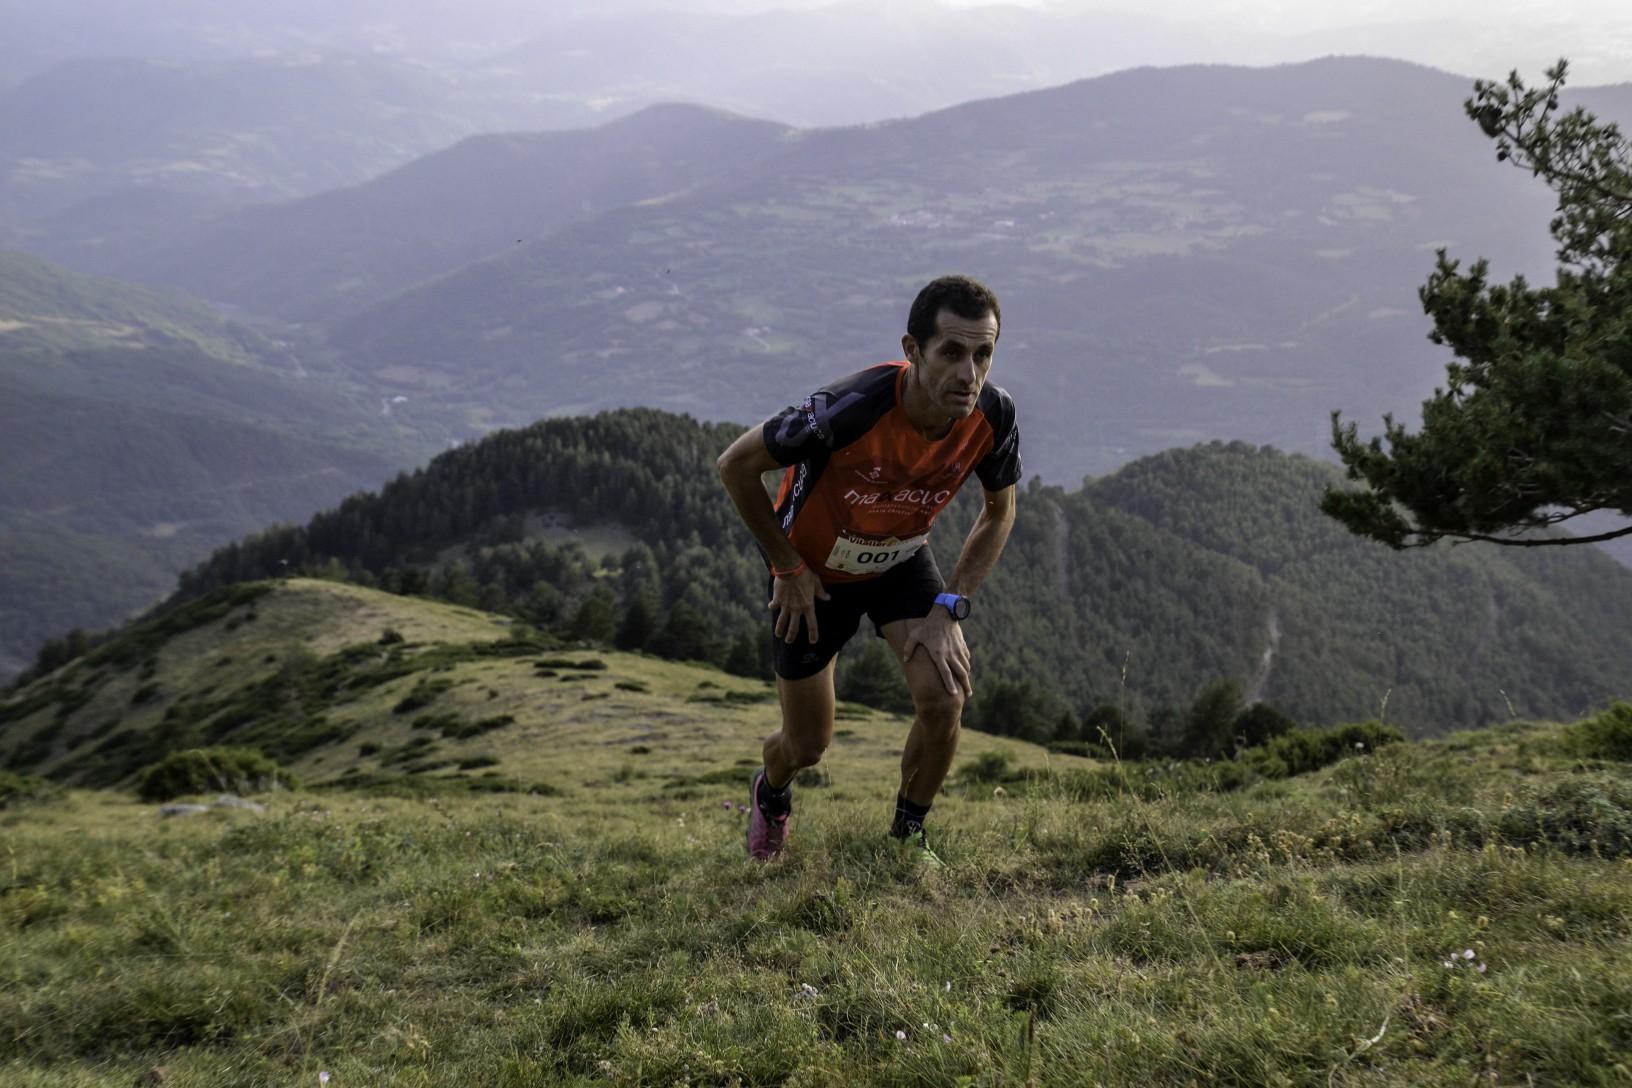 Agustí Roc i Silvia Leal es proclamen campions de l'Skyrunning National Championship Vertical a la Vilaller Vertical Race